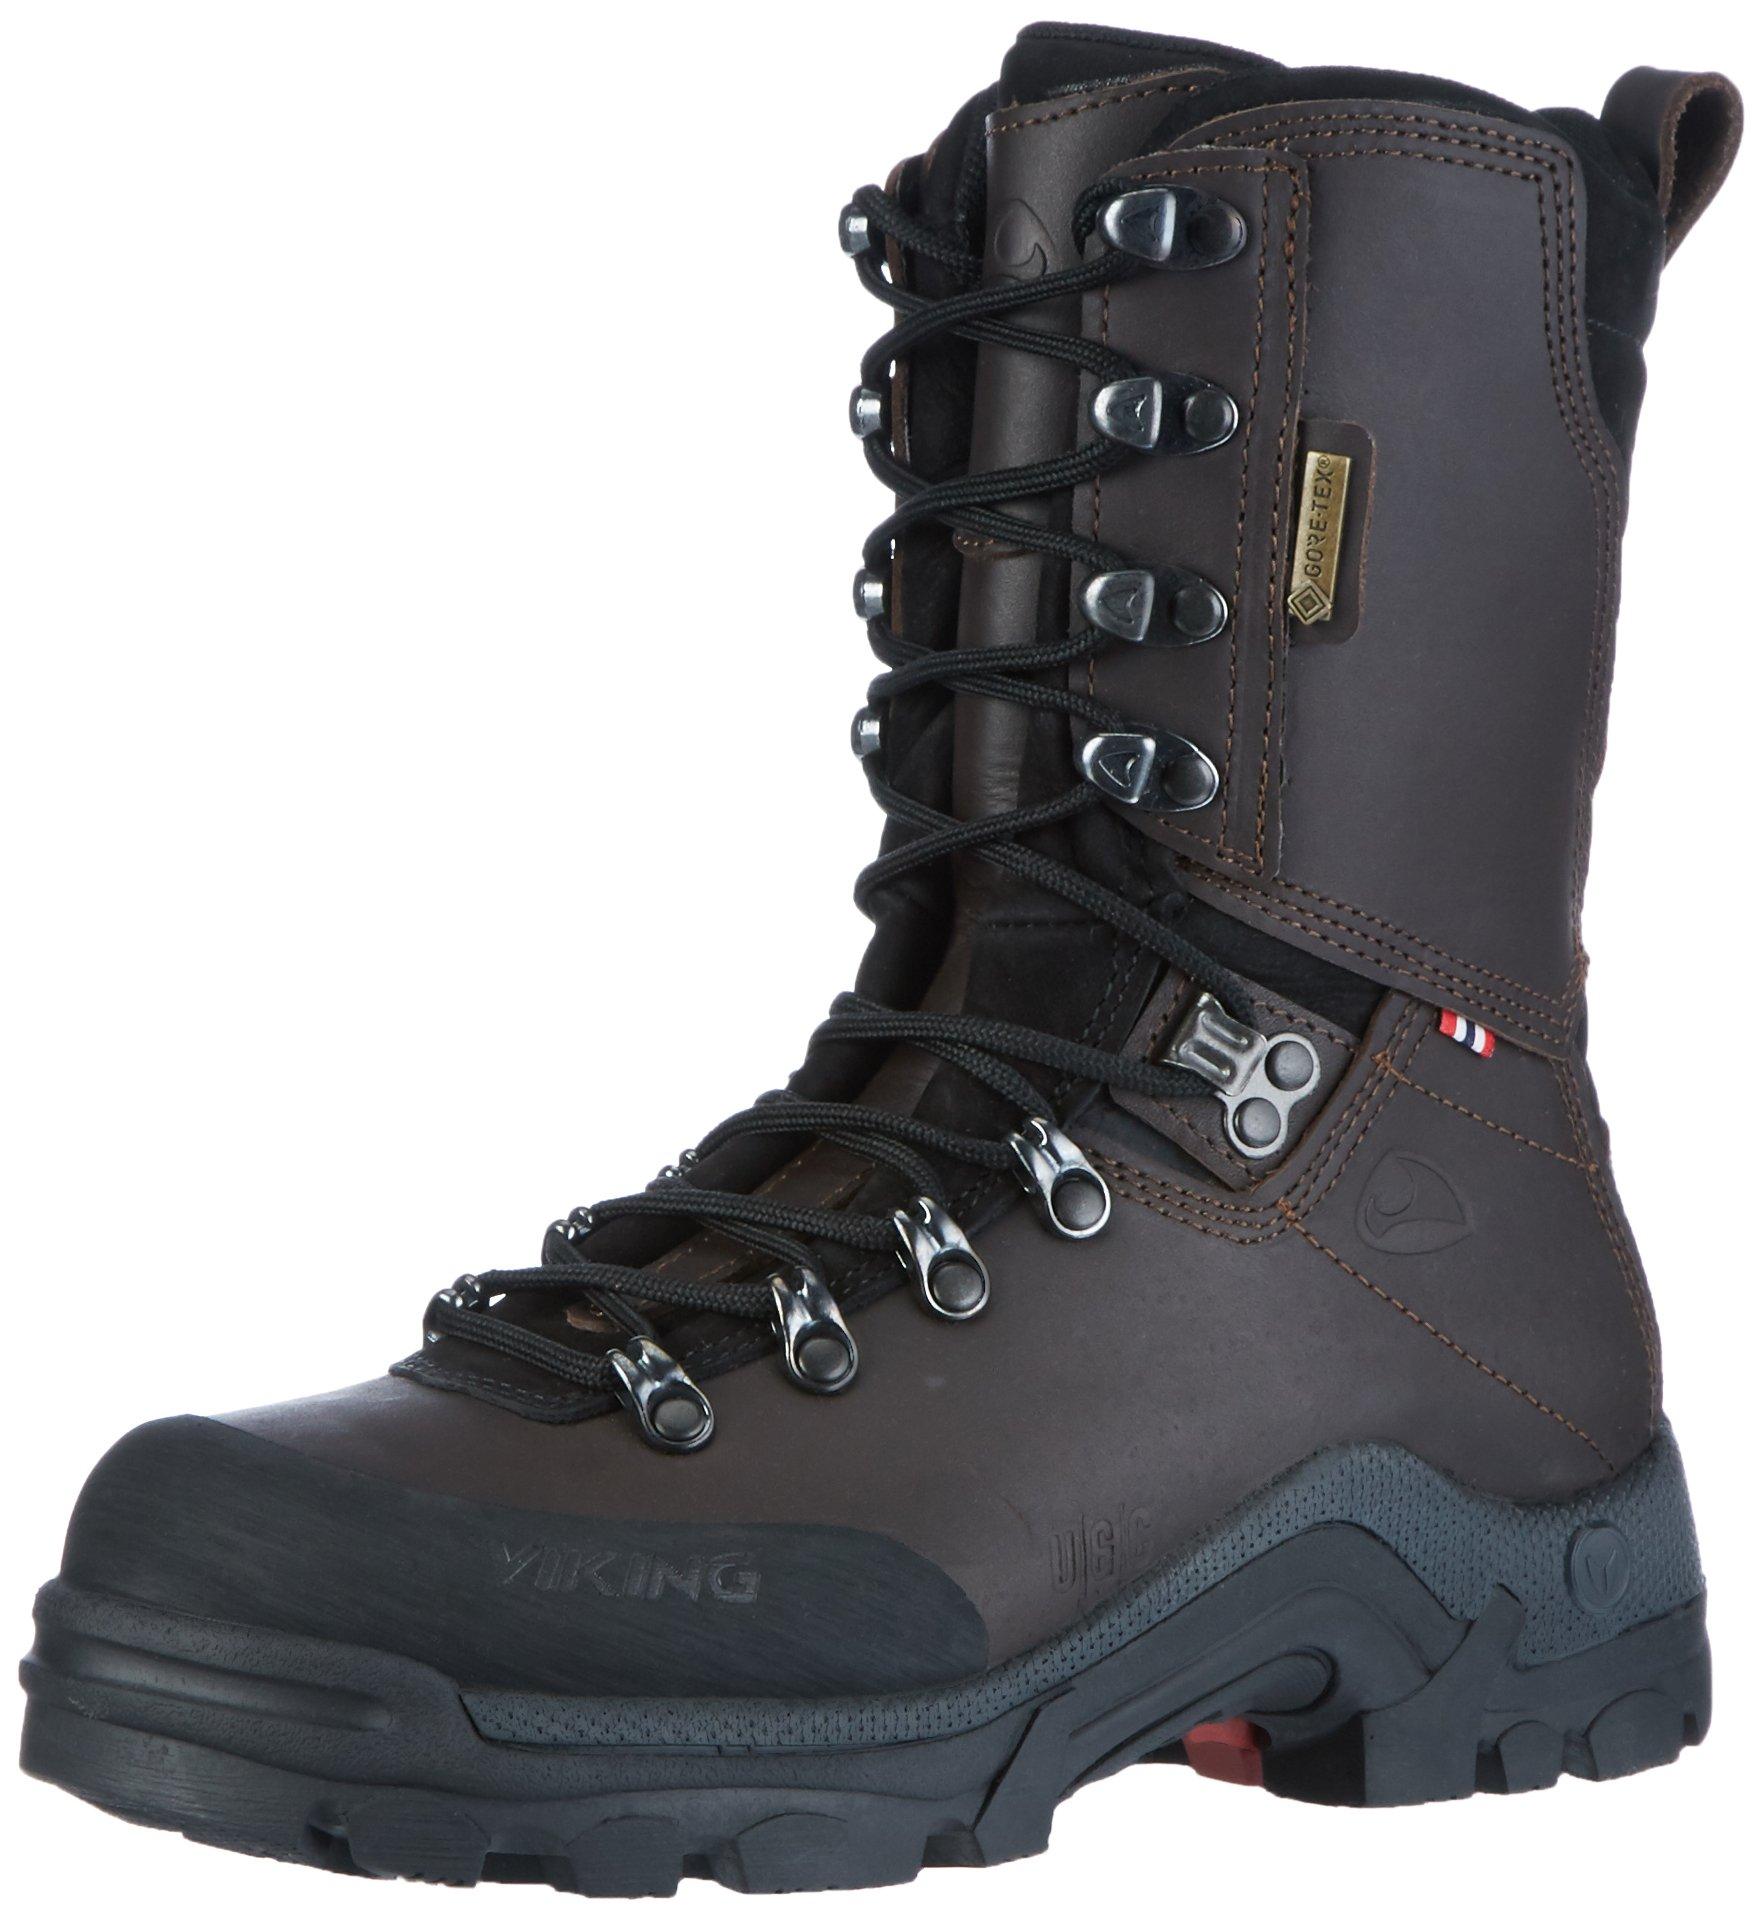 Viking Unisex Adults' Hunter GTX Hunting Shoes, Brown (Dark Brown 18), 9 UK